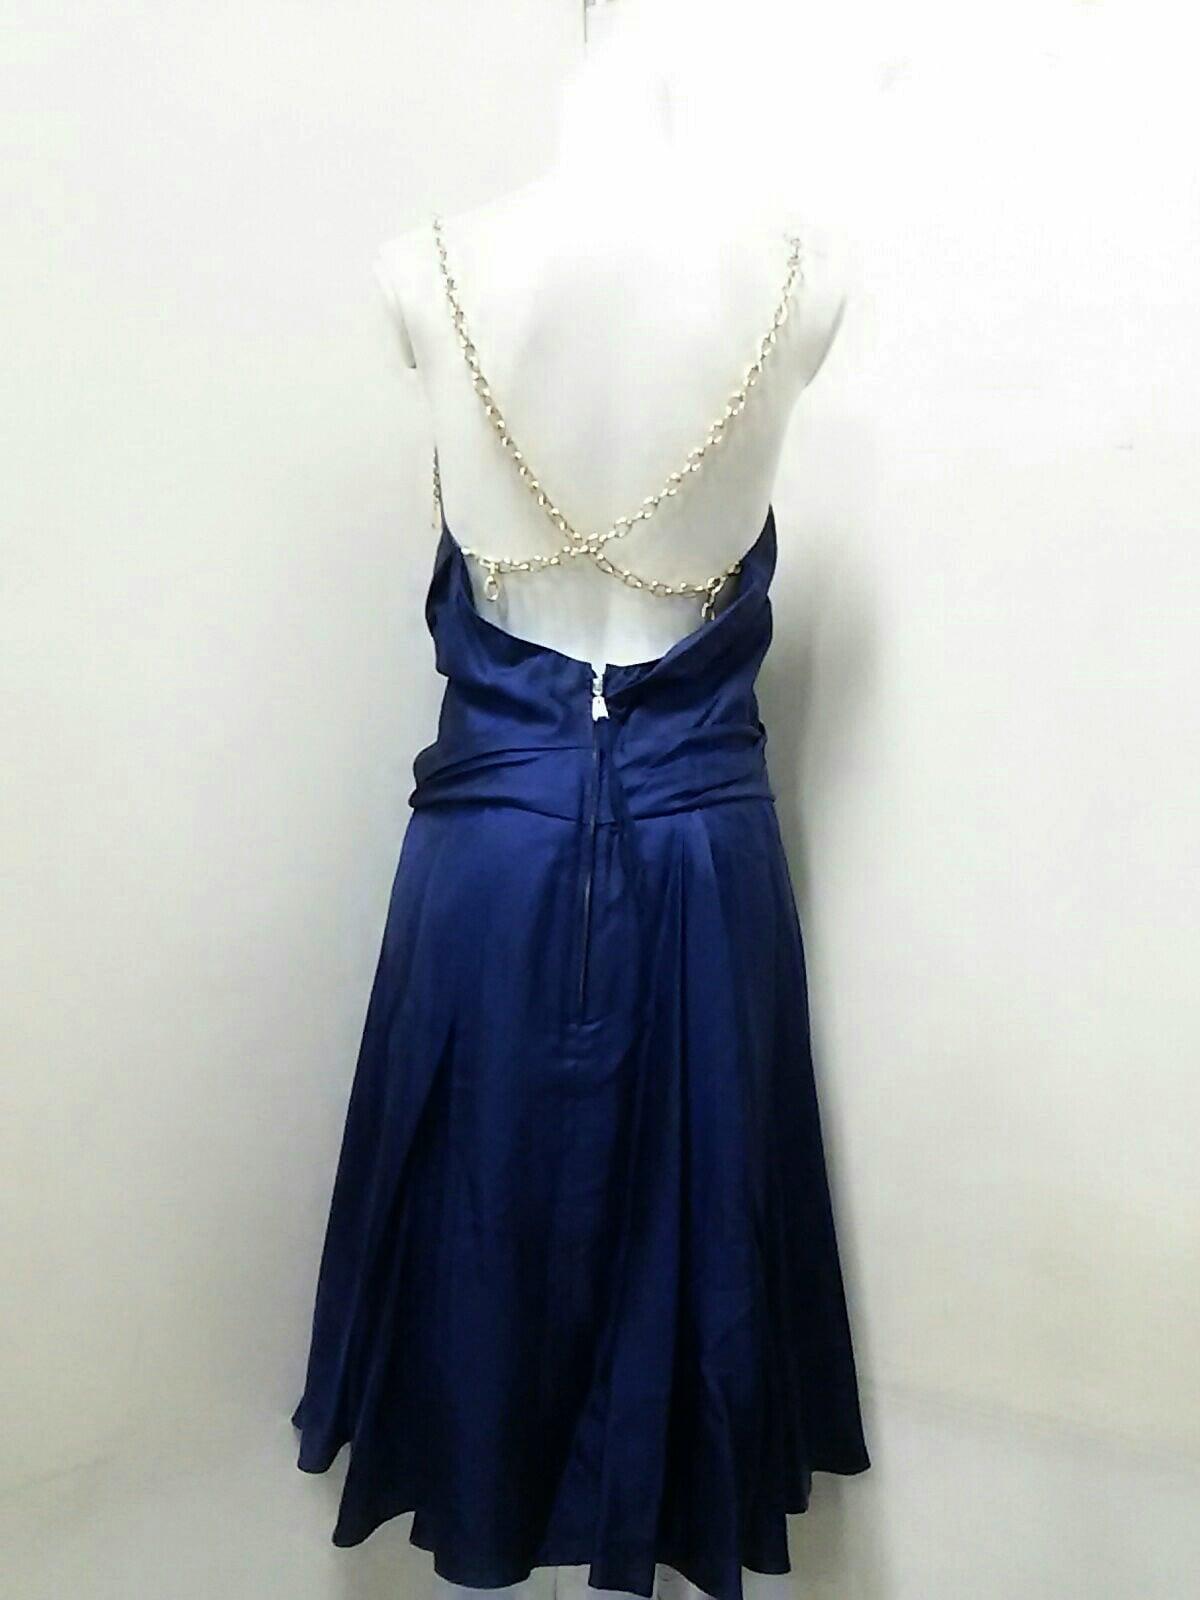 LOUIS VUITTON(ルイヴィトン)のドレス